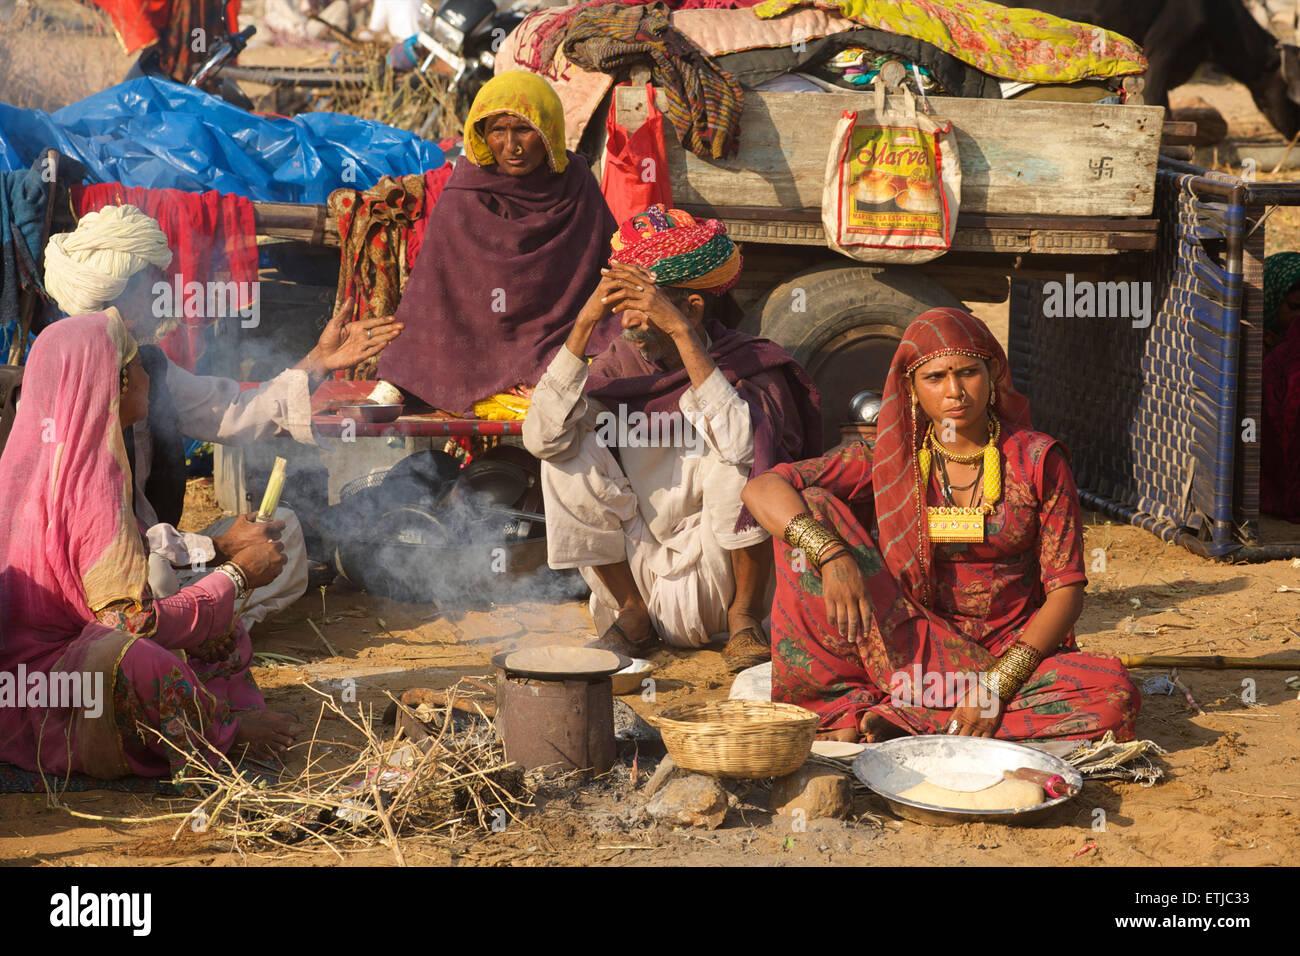 Famiglia di Rajasthani presso la fiera di Pushkar. Rajasthan, India Immagini Stock